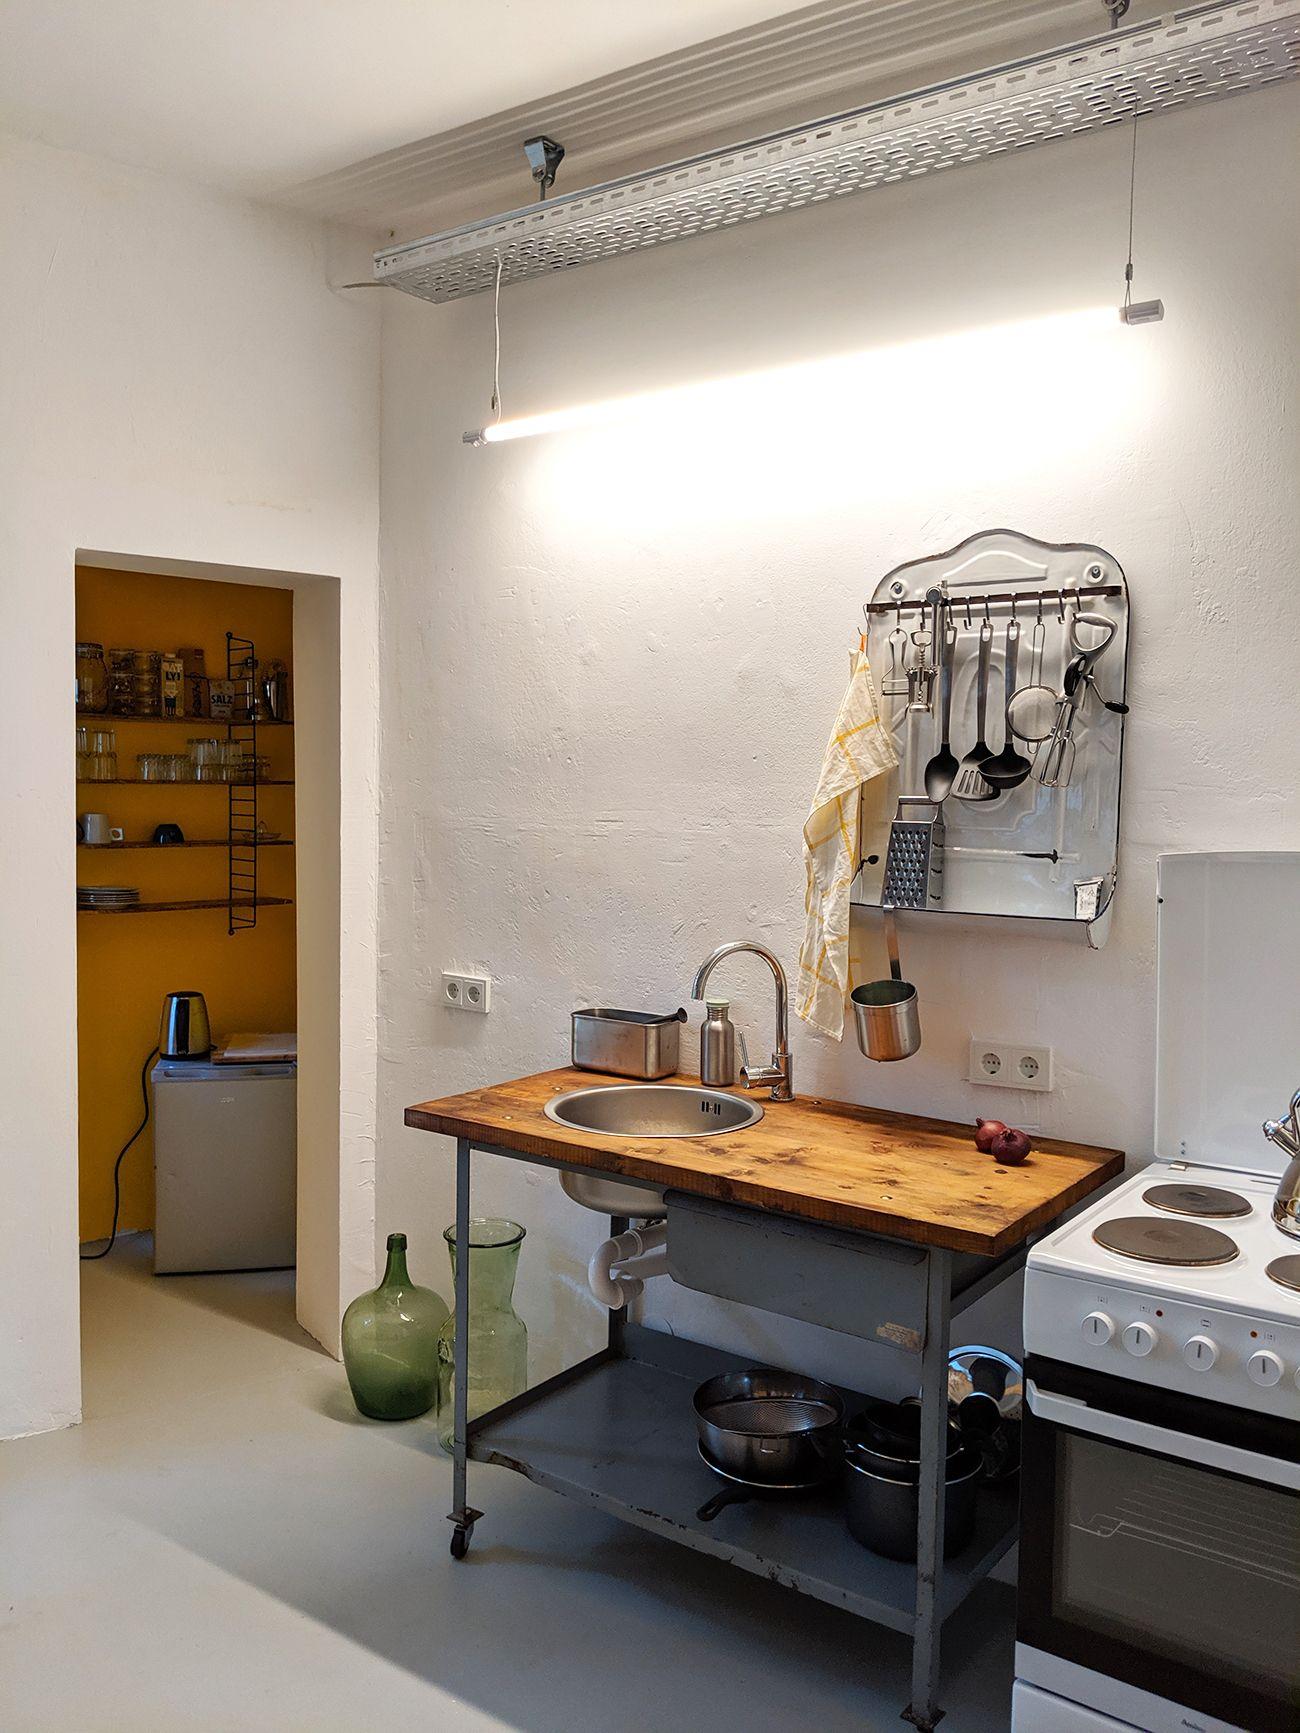 Minimalistische Kuche In Leipzig In 2020 Kuchen Inspiration Retro Kuche Kuche